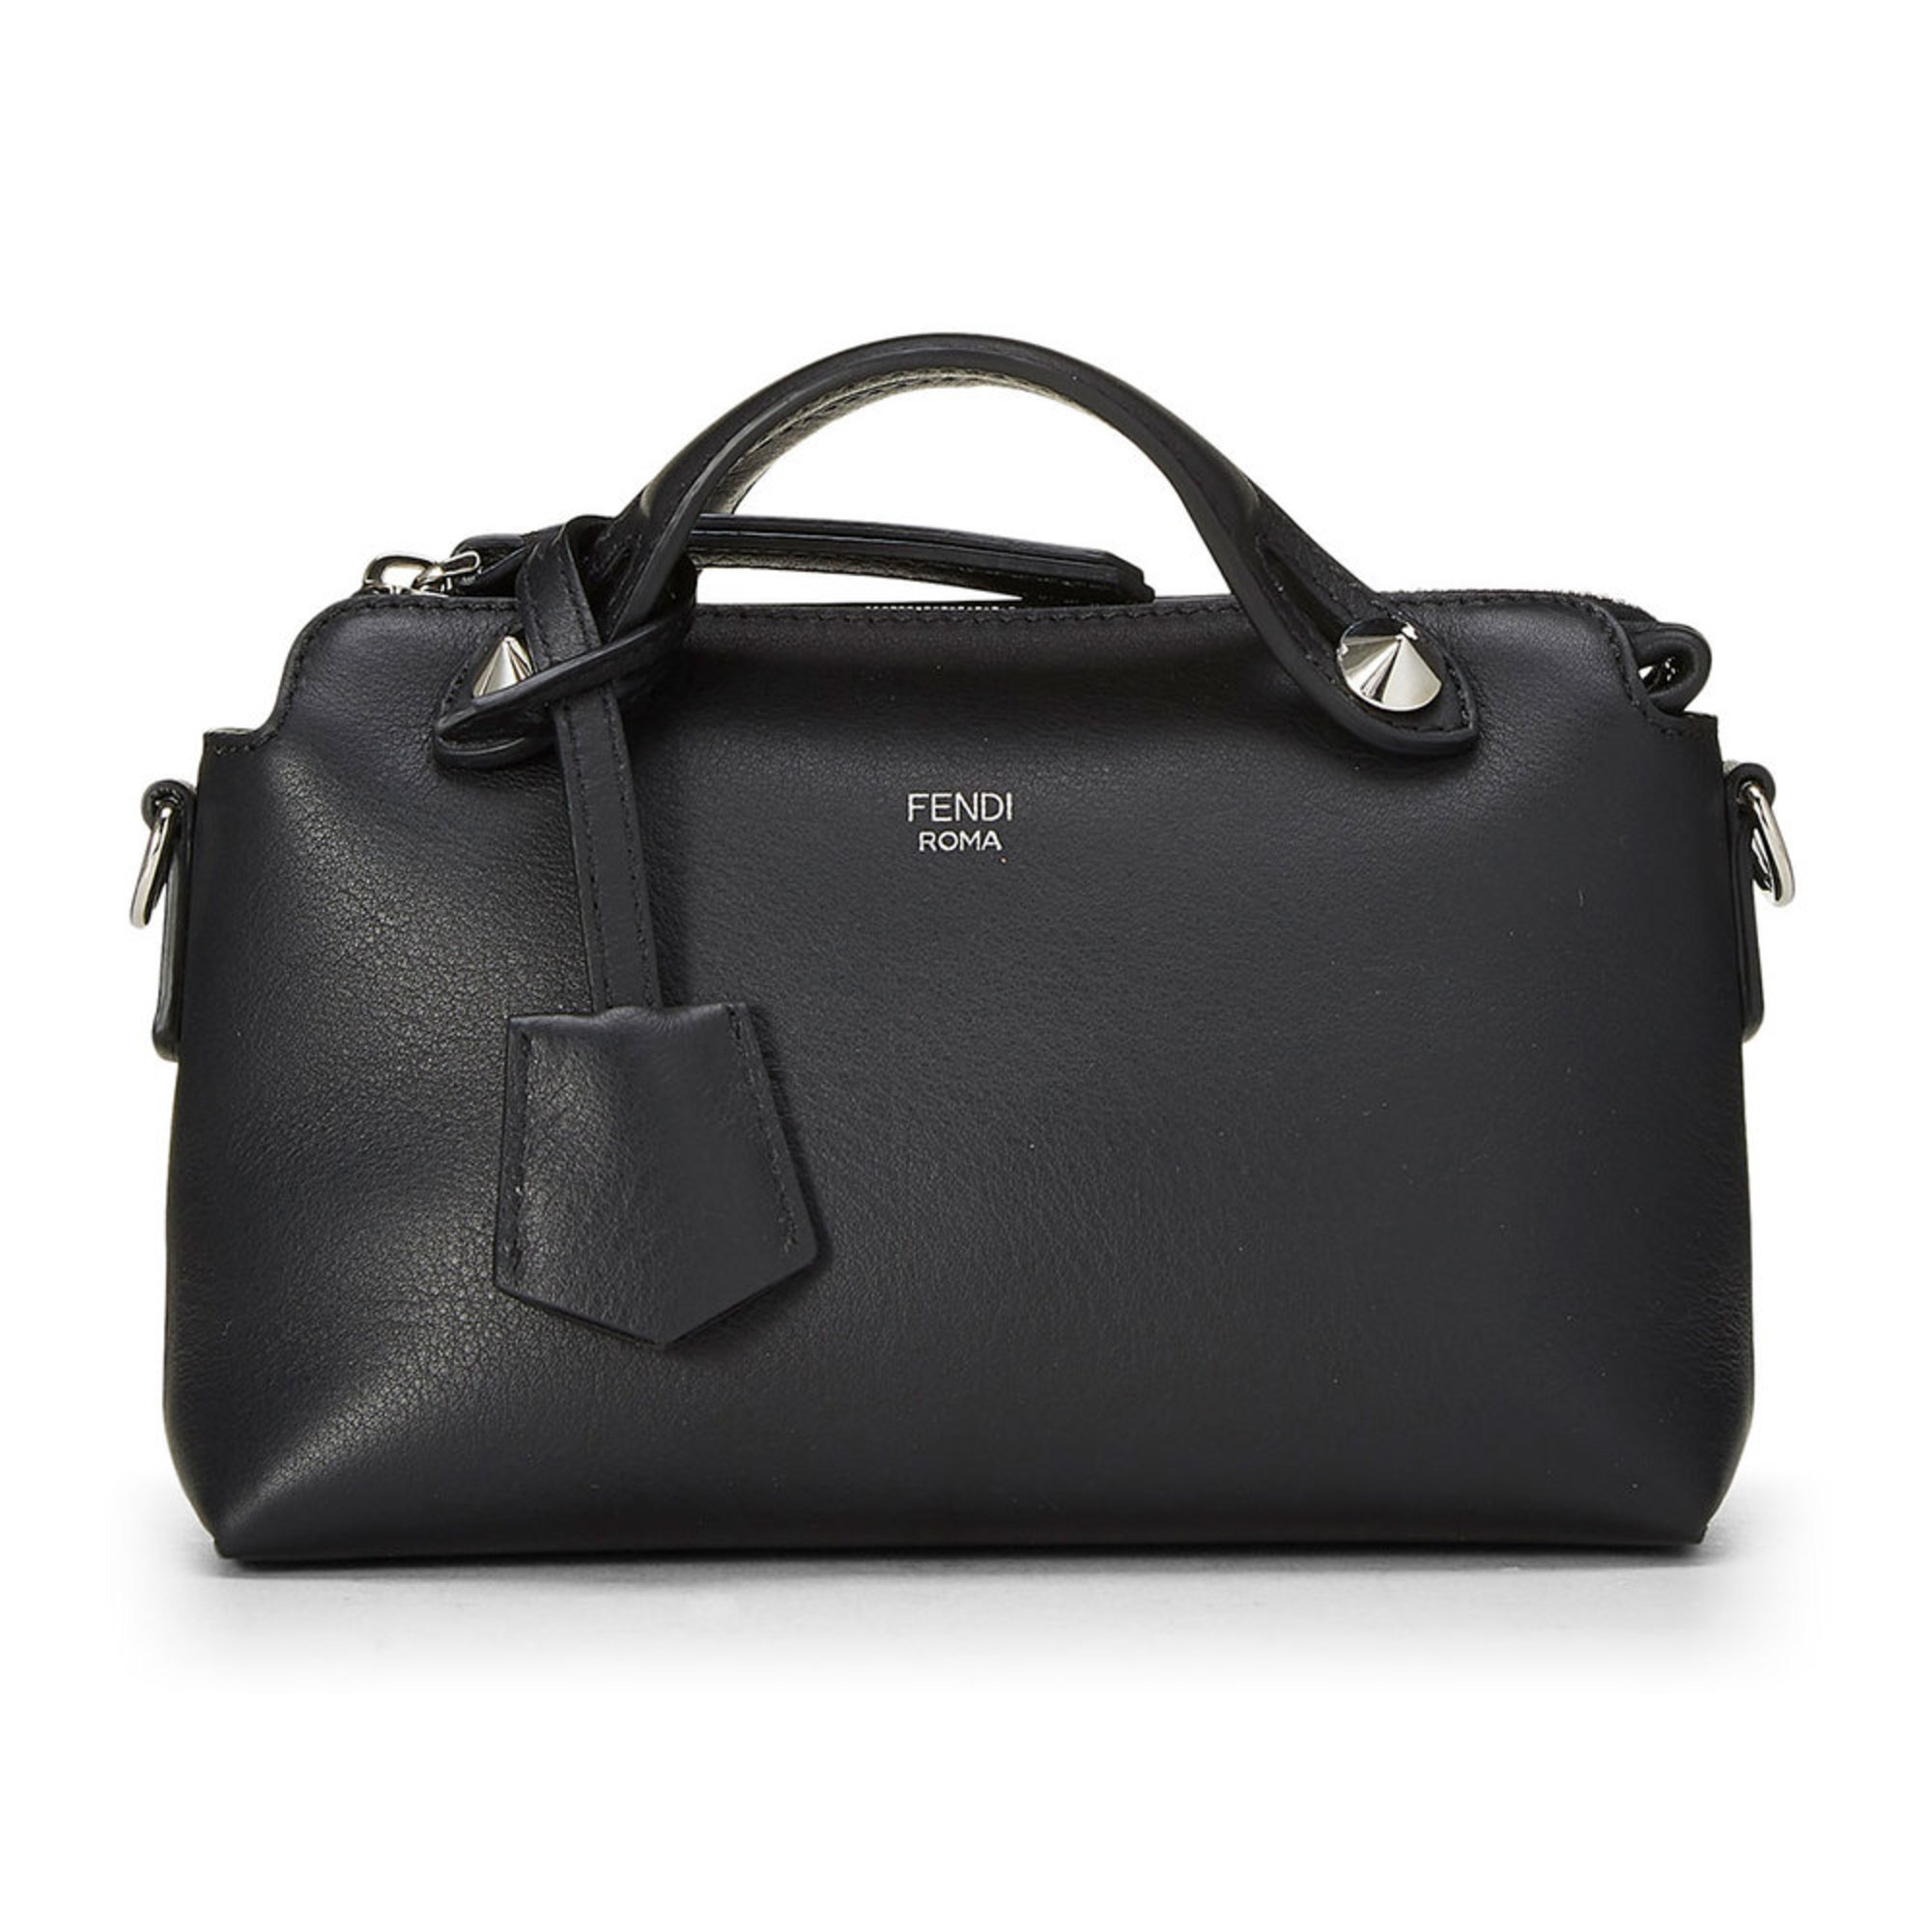 8597ef0732 Fendi Leather By The Way Mini Black | Crossbody & Messenger Bags ...